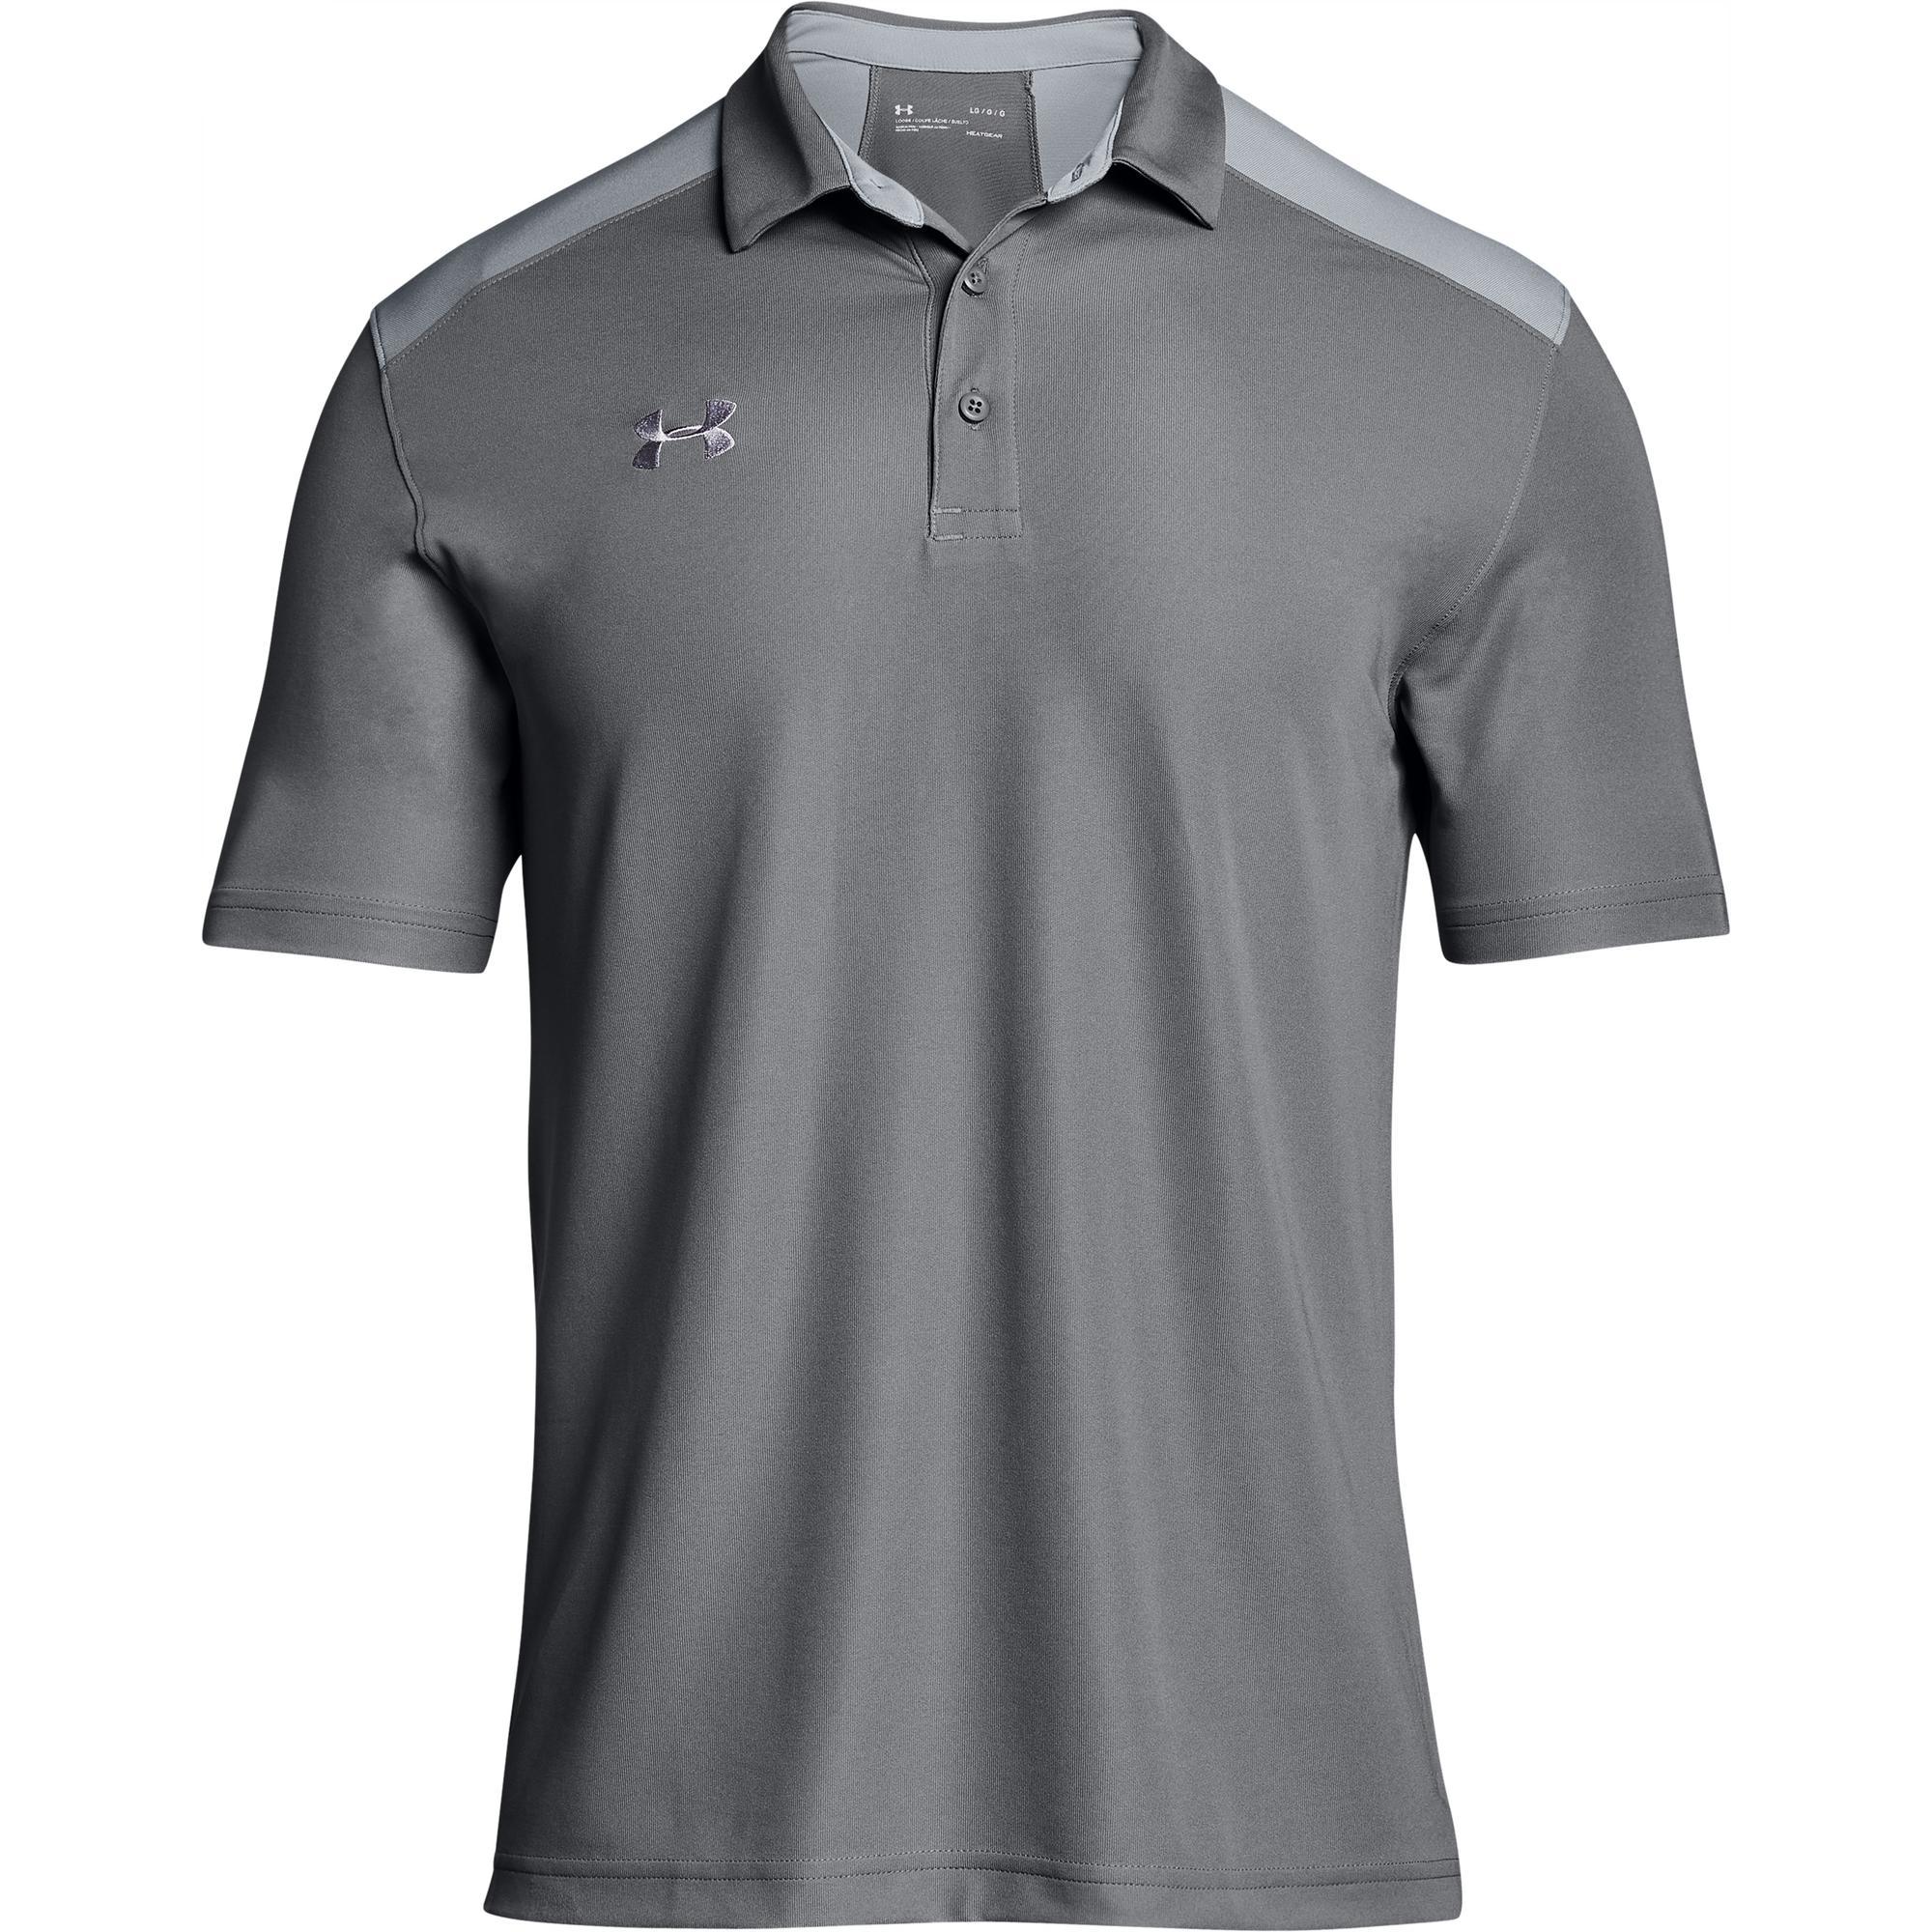 Men's Colorblock Short Sleeve Shirt